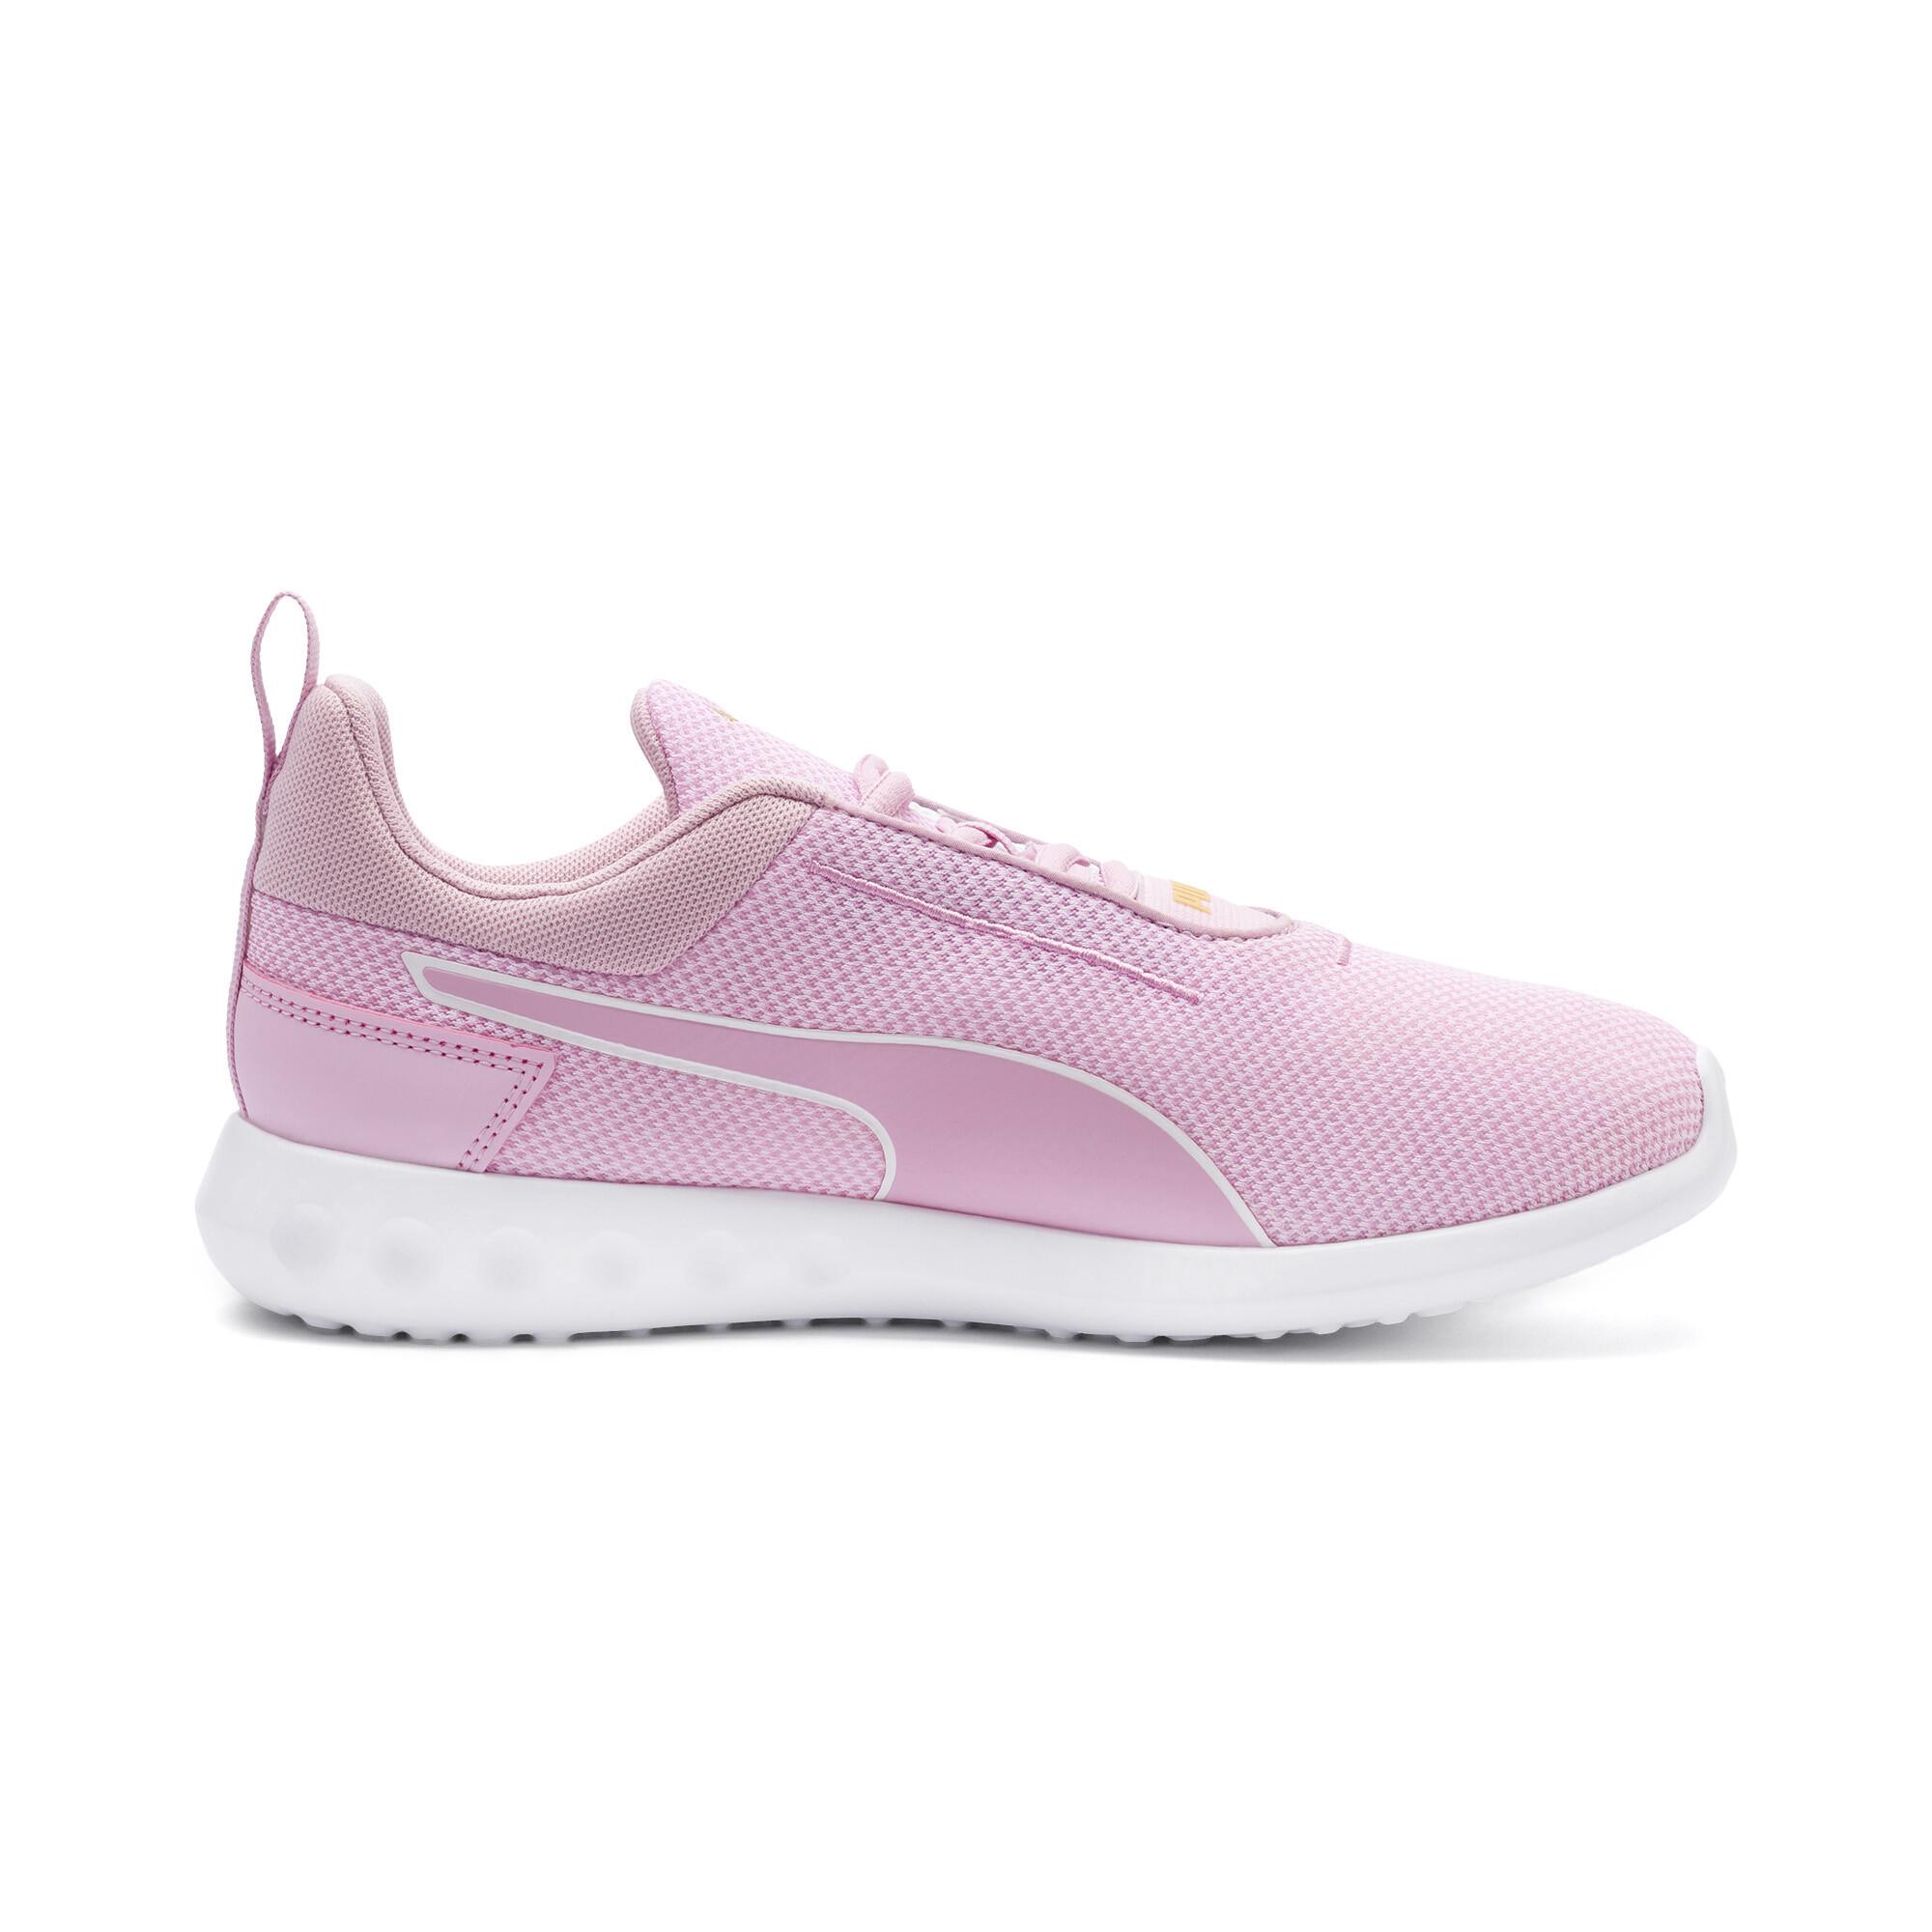 PUMA-Carson-2-Concave-Women-s-Training-Shoes-Women-Shoe-Running thumbnail 12